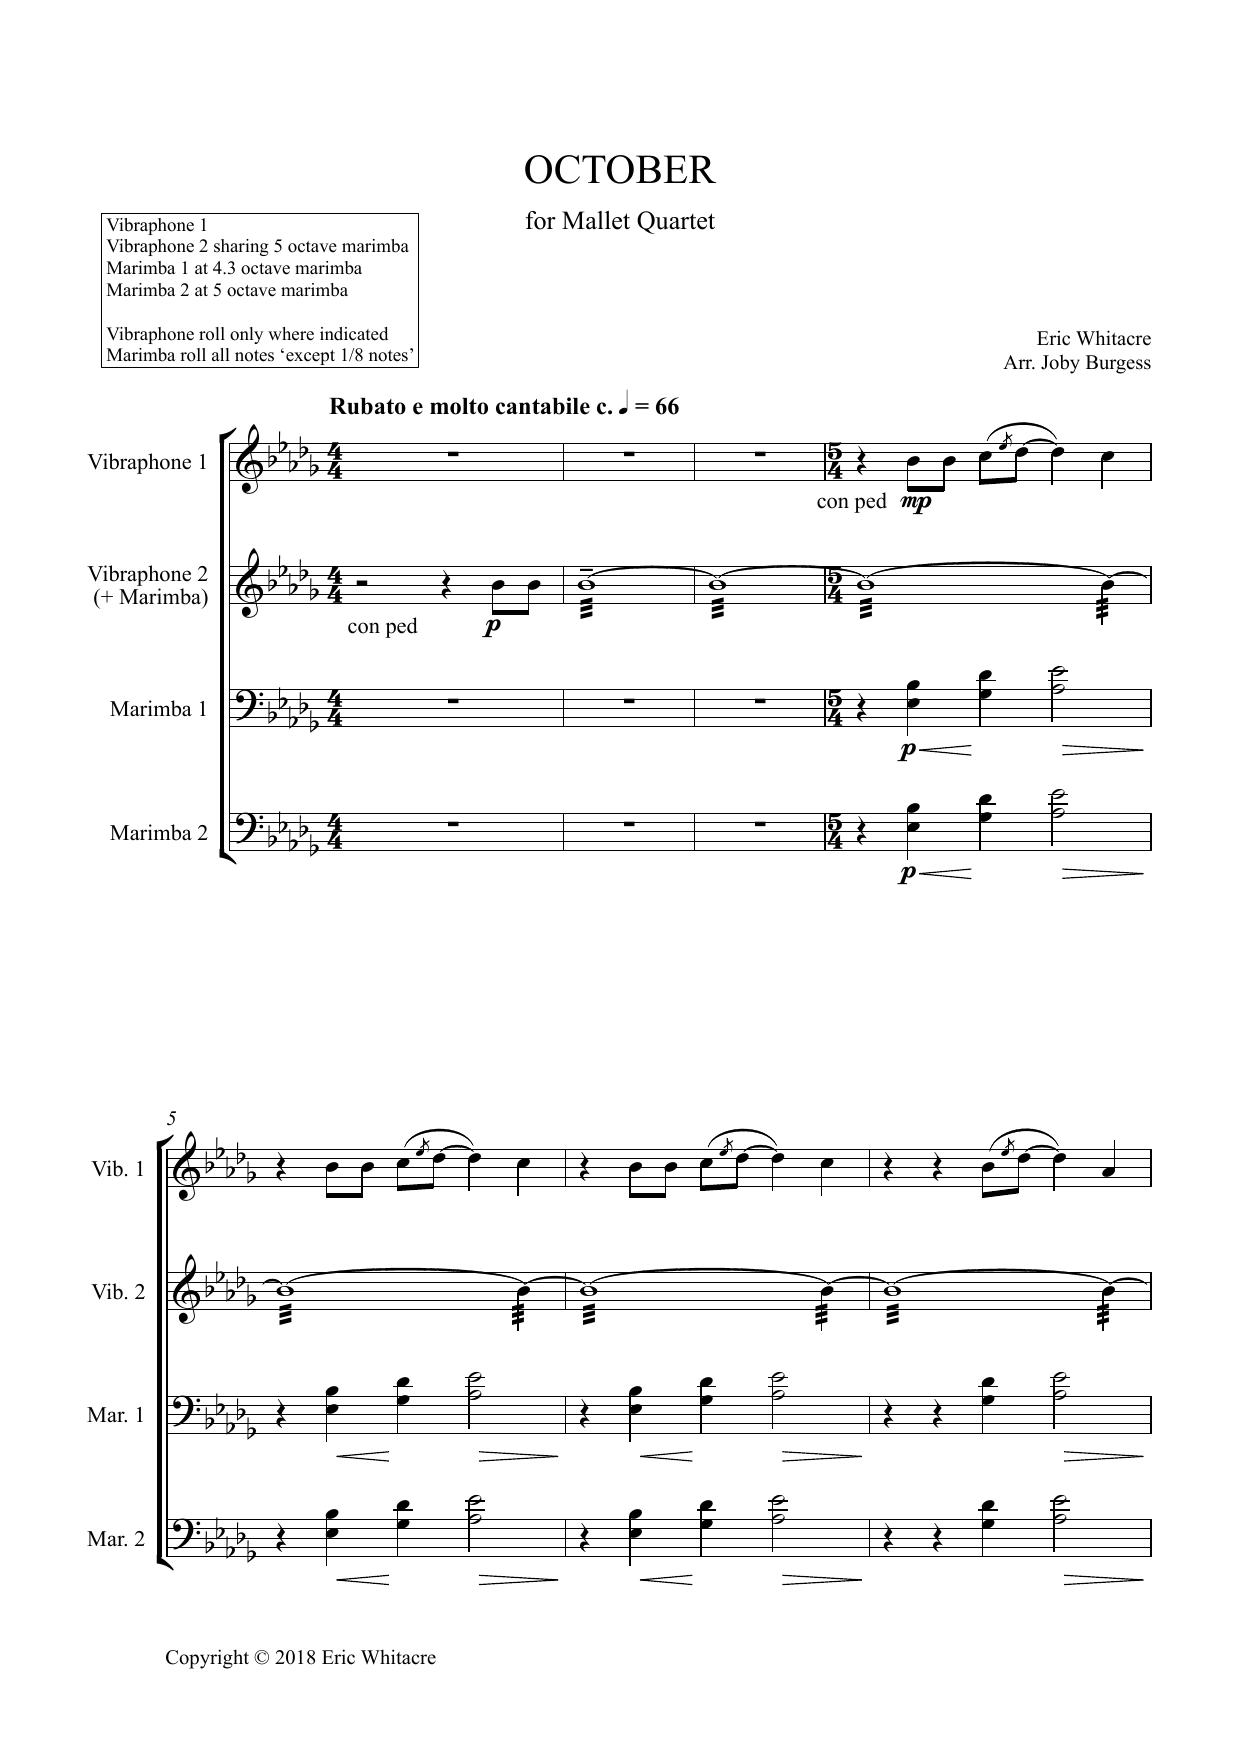 October (Alleluia) for Mallet Quartet (arr. Joby Burgess) - Full Score Sheet Music